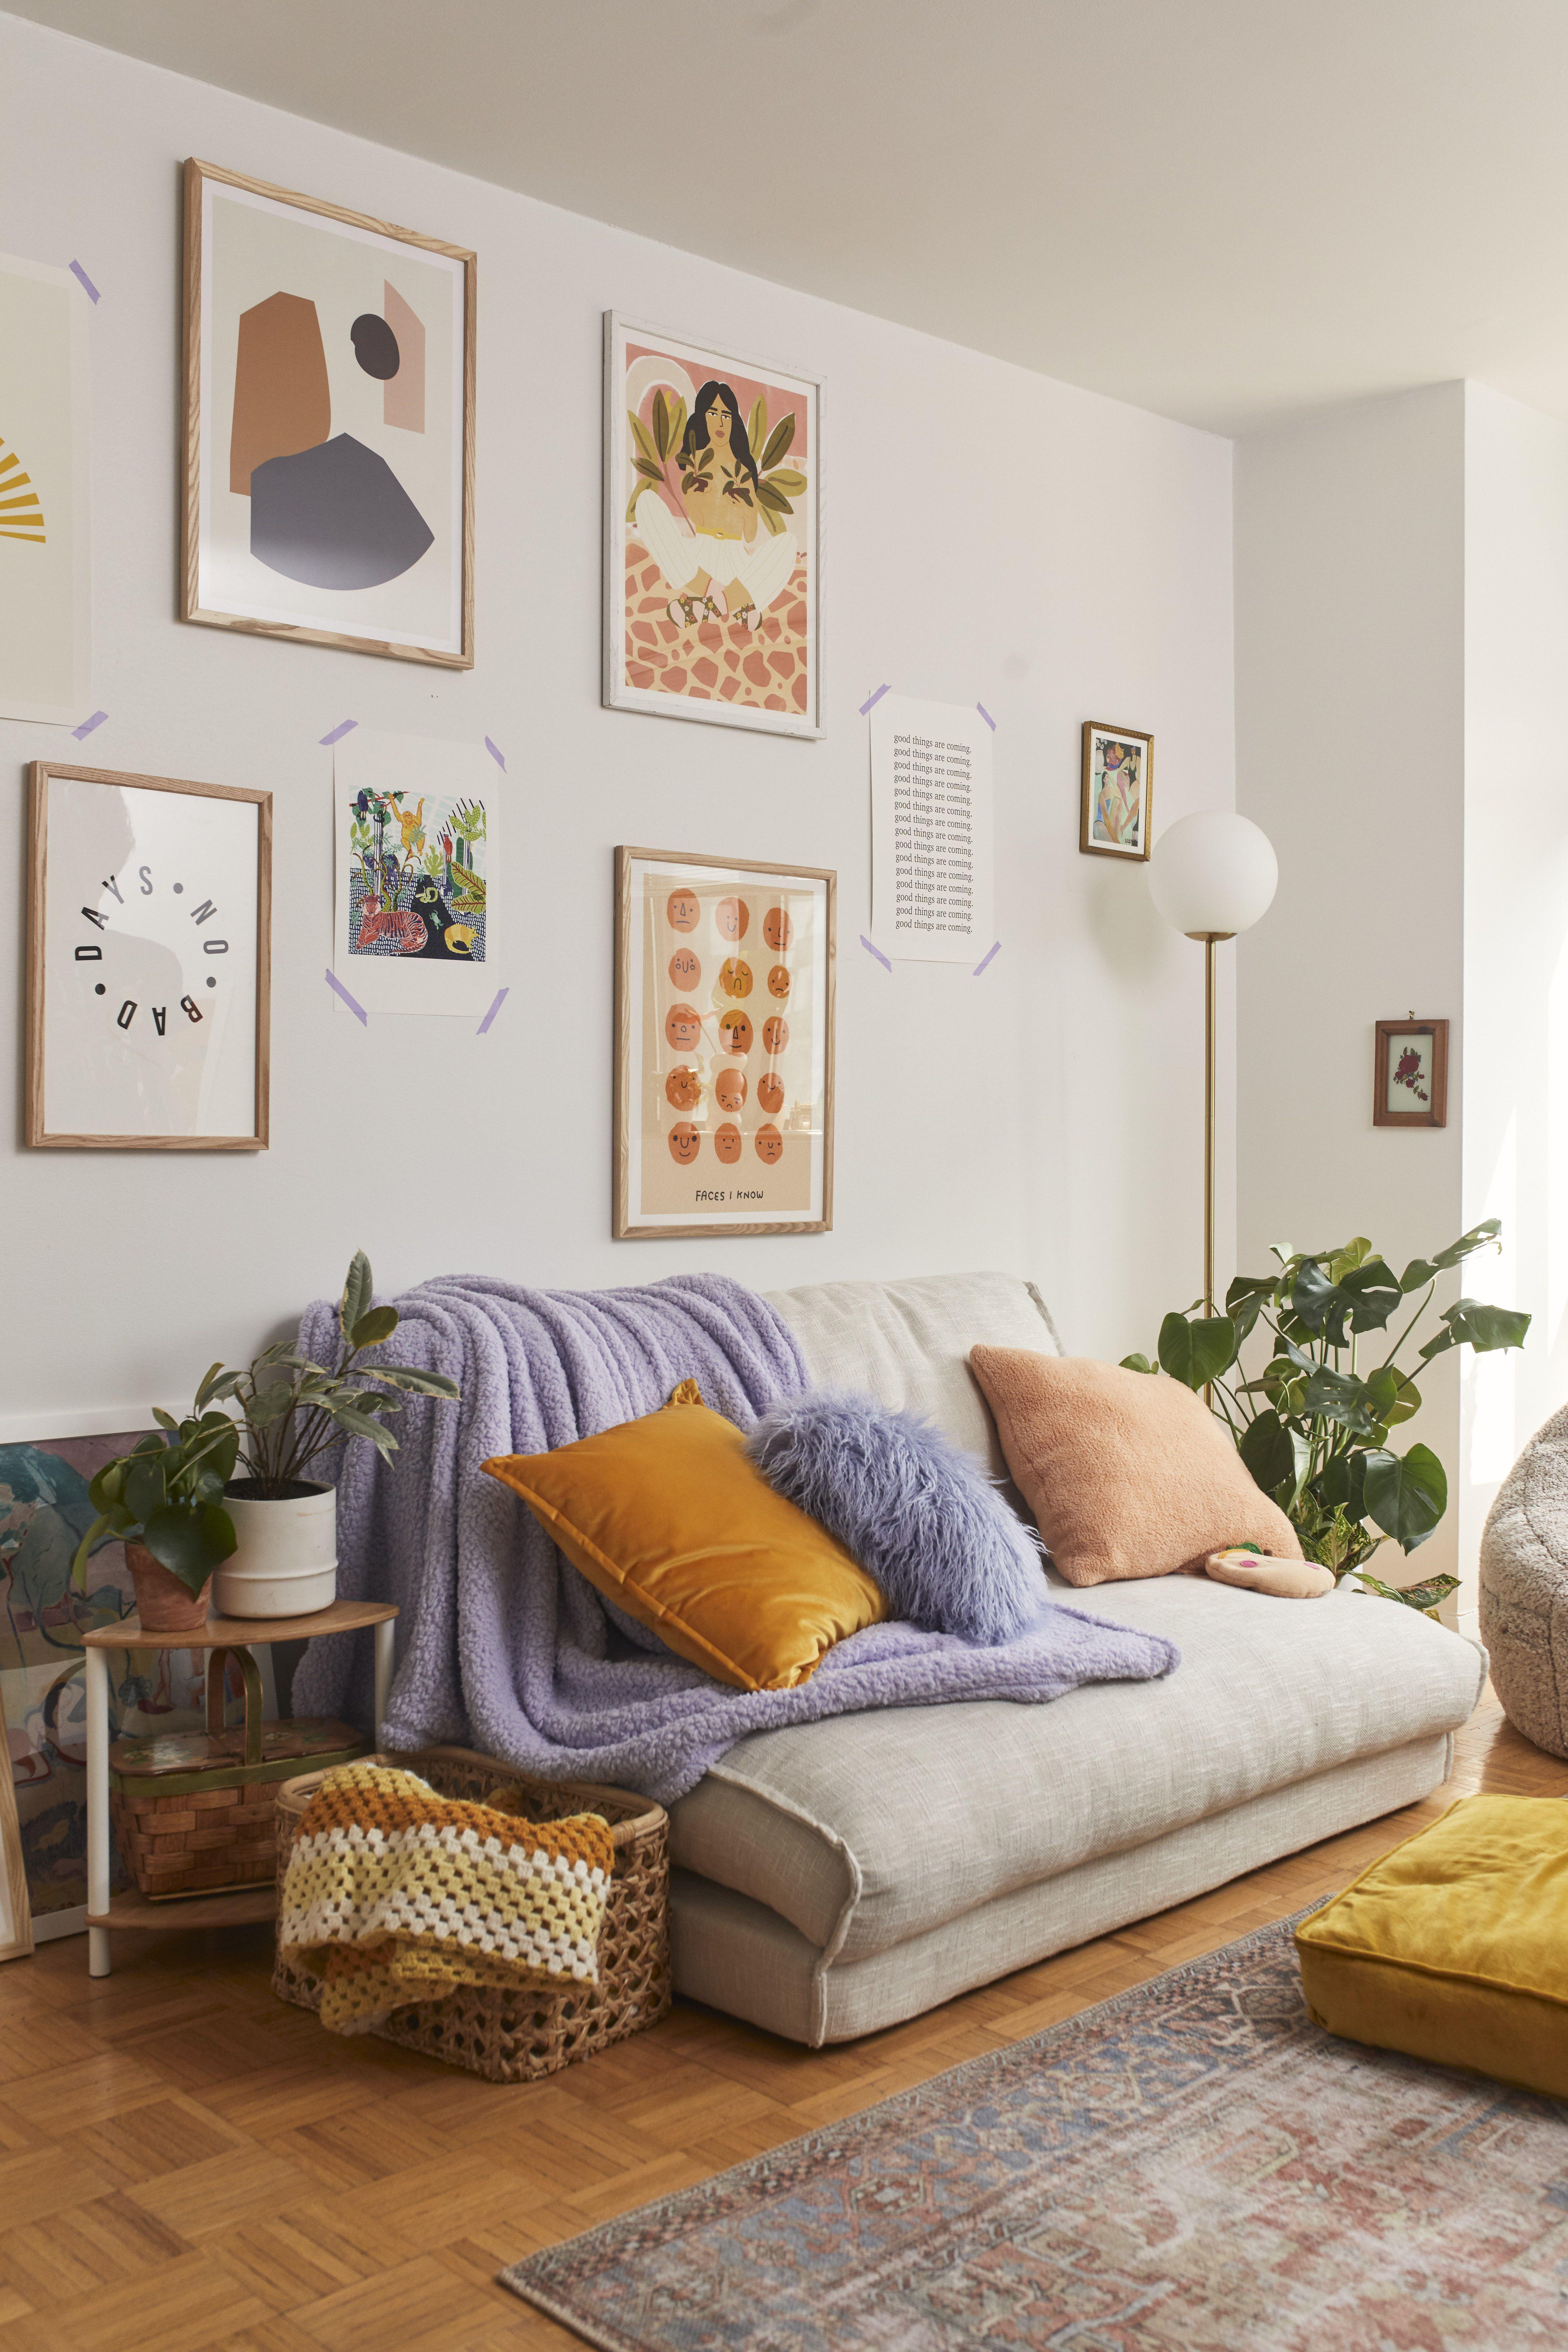 living room, wooden floor, white wall, grey foldable sofa, yellow ottoman, side table, white bulb floor lamp